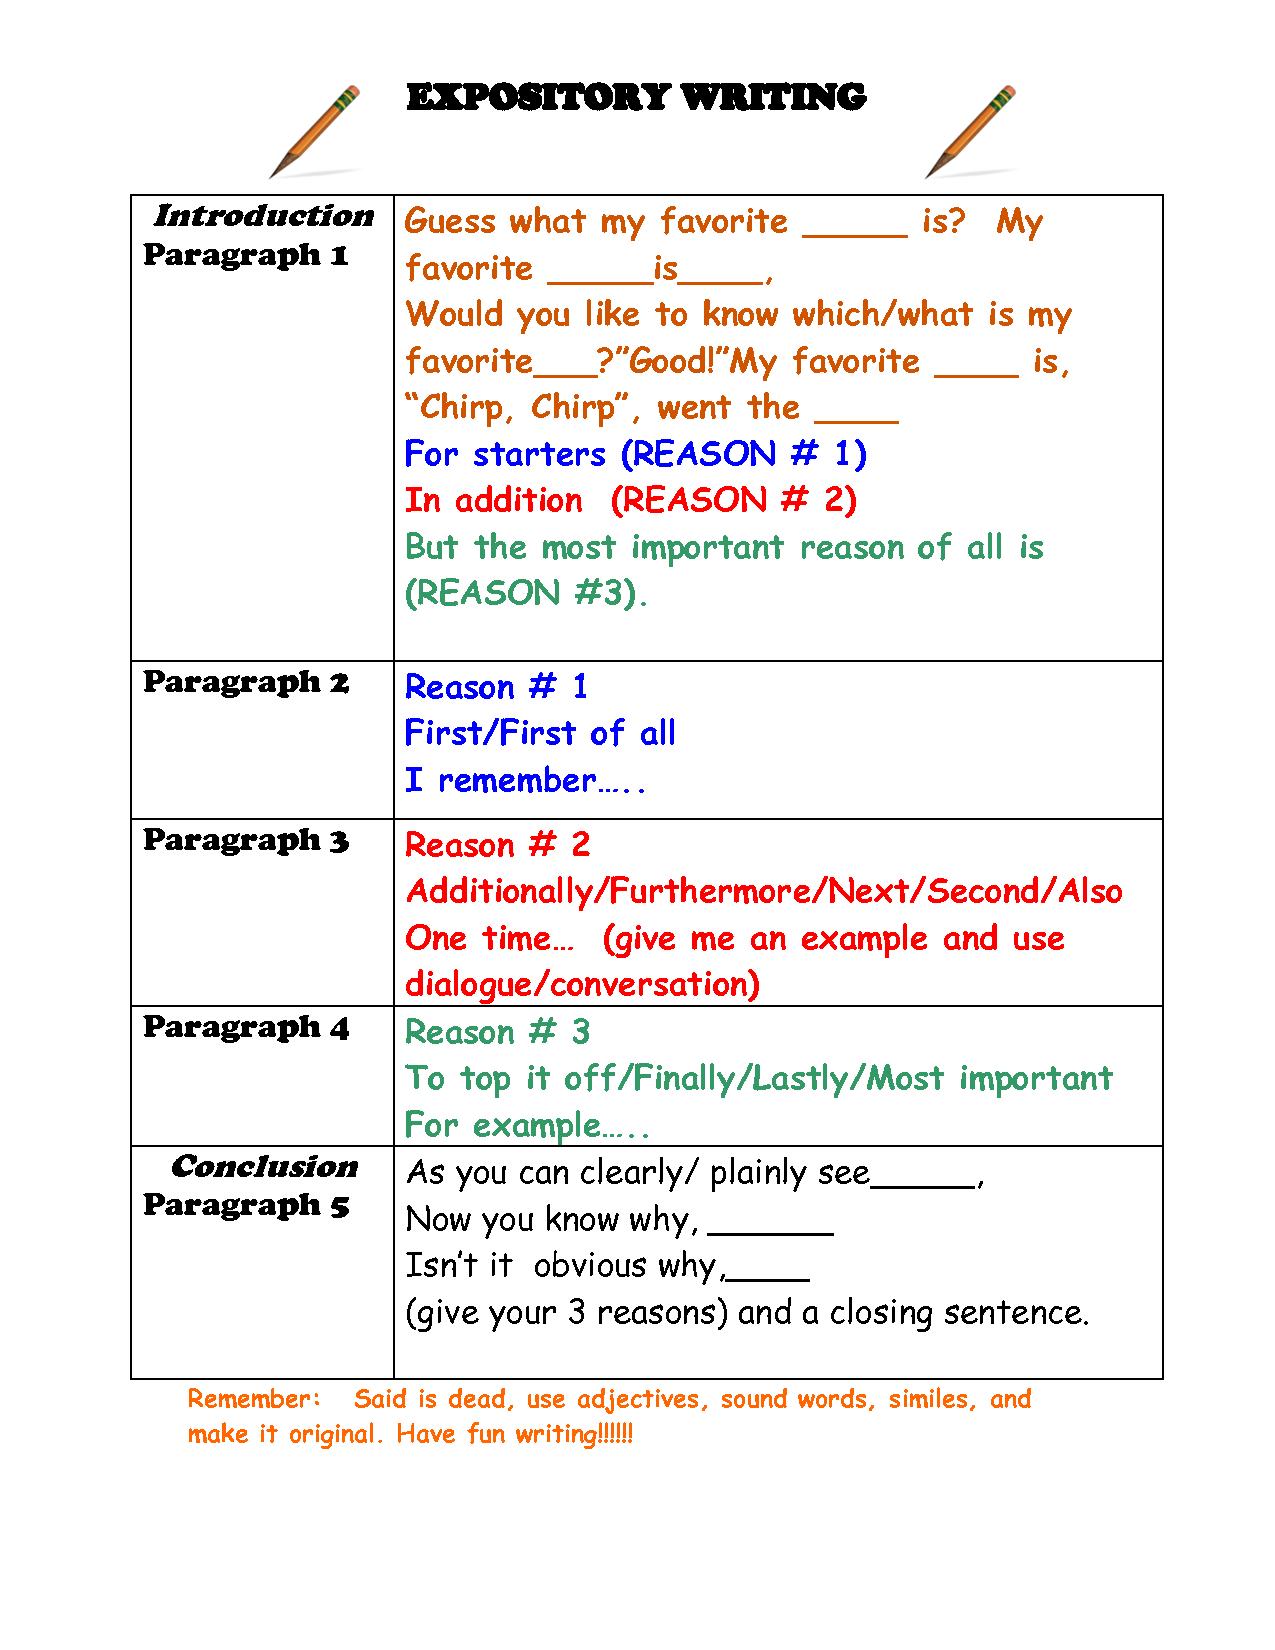 Free Expository Writing Graphic Organizer